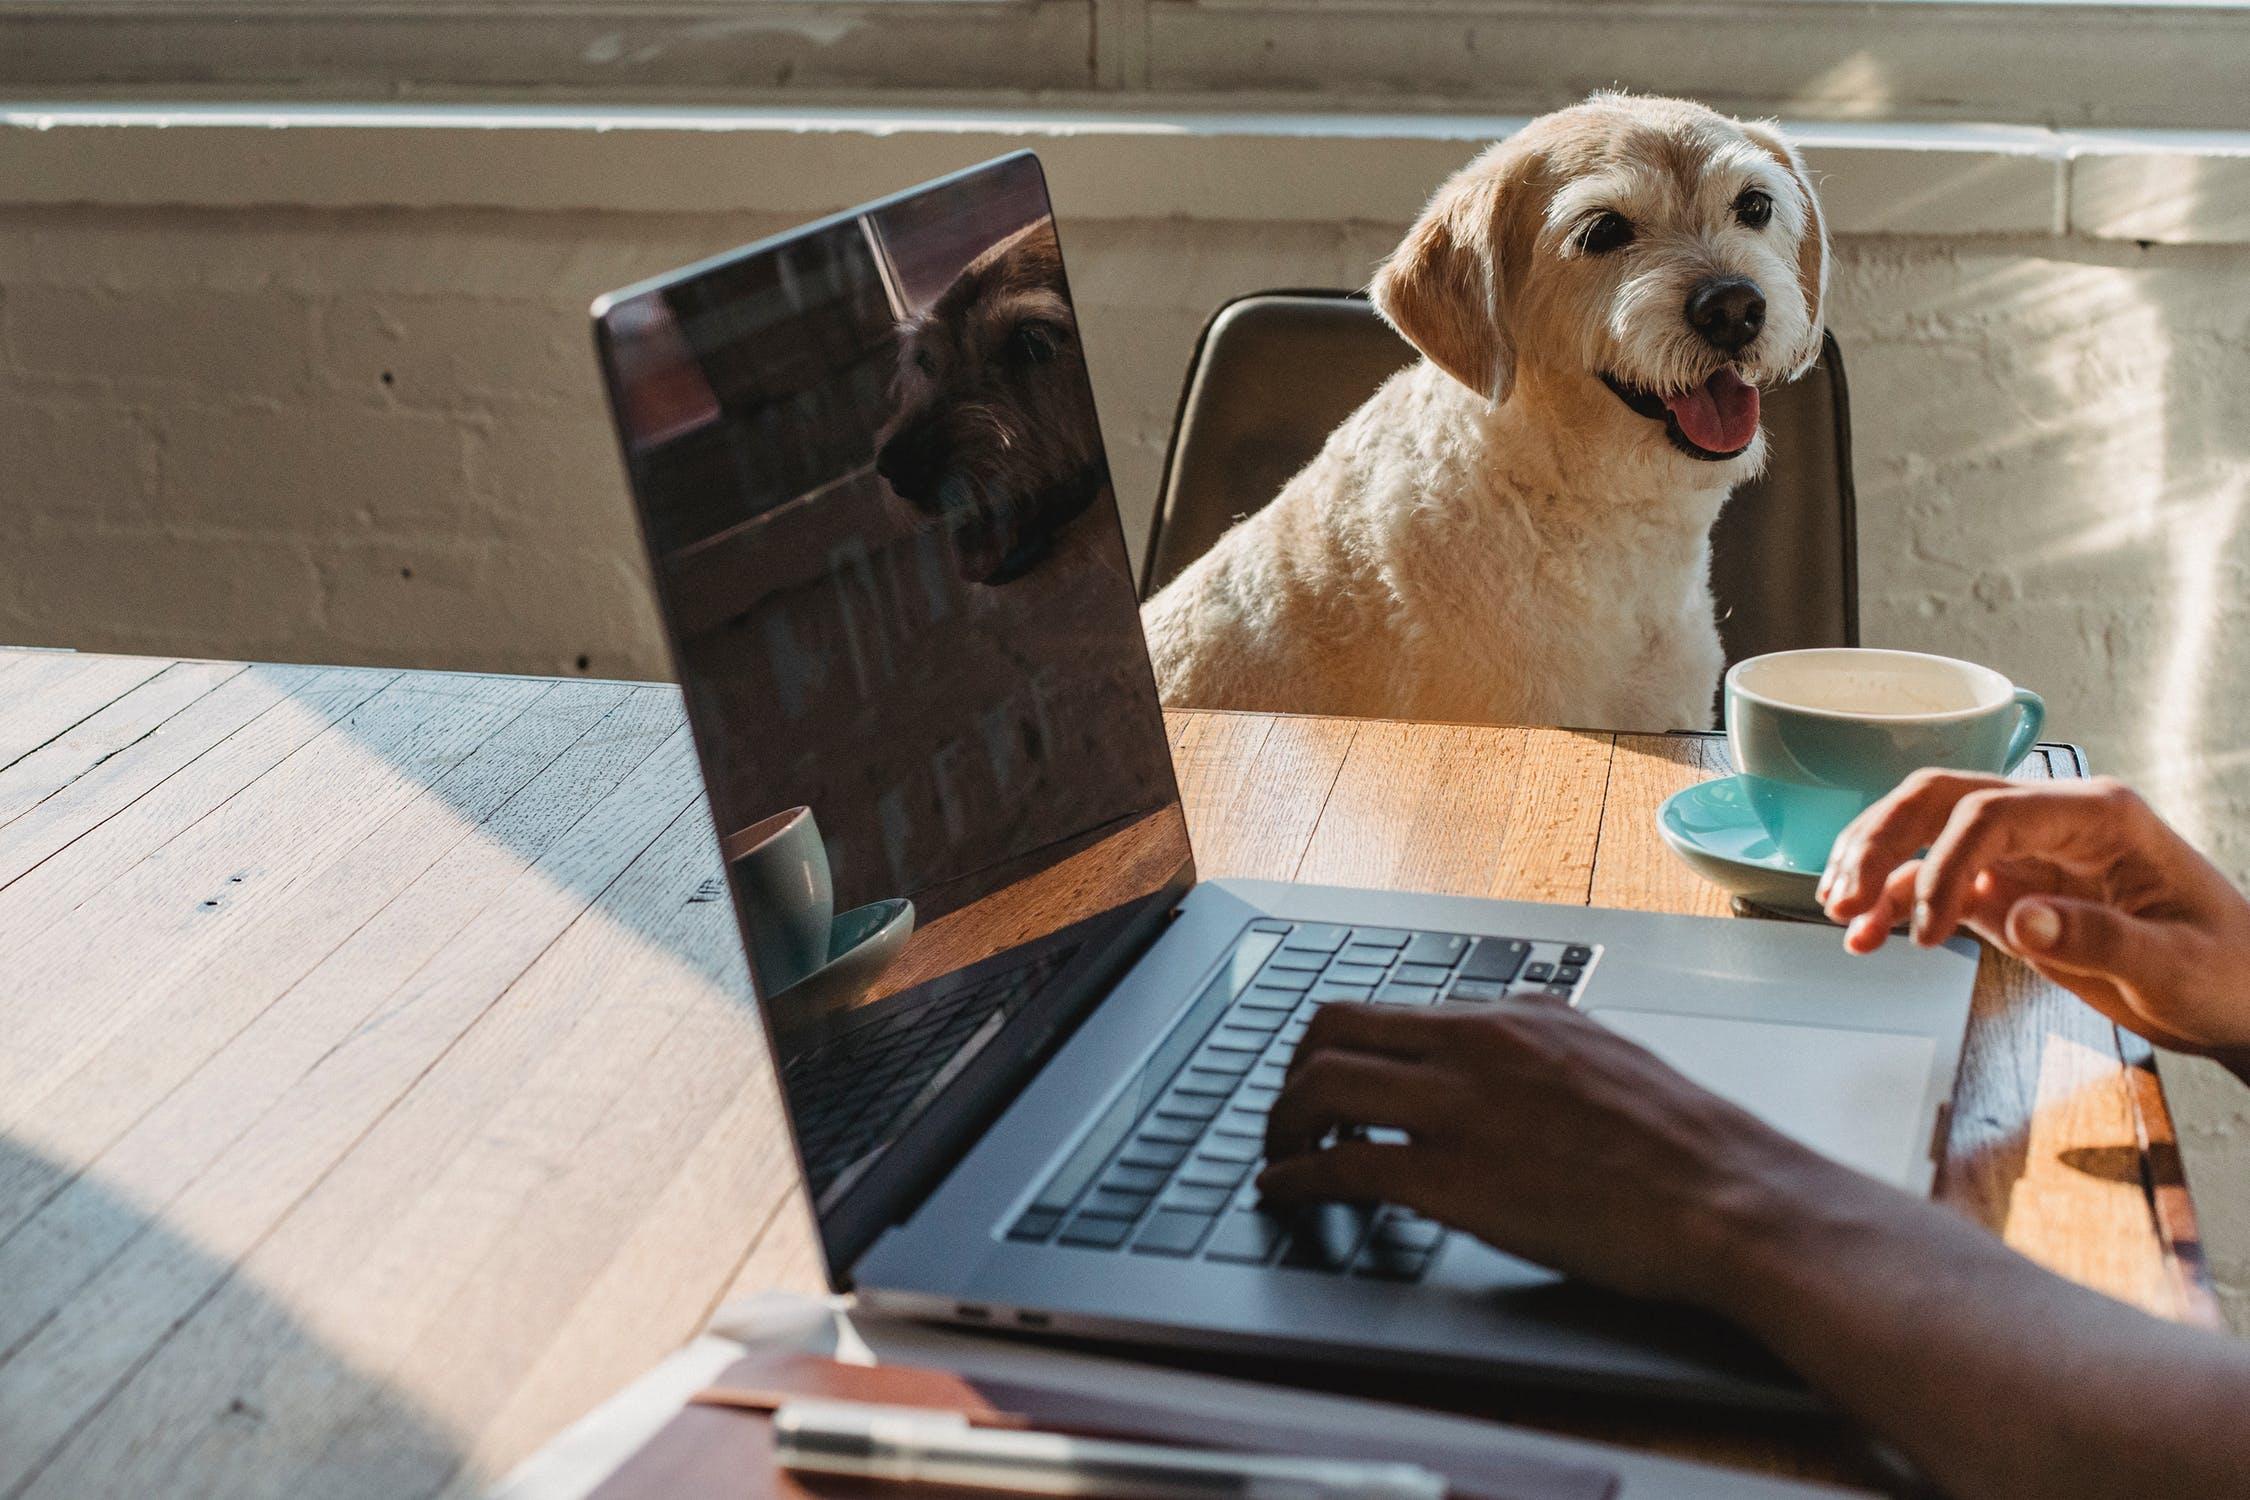 Behind the scenes - meet inSTREAMLY pets!